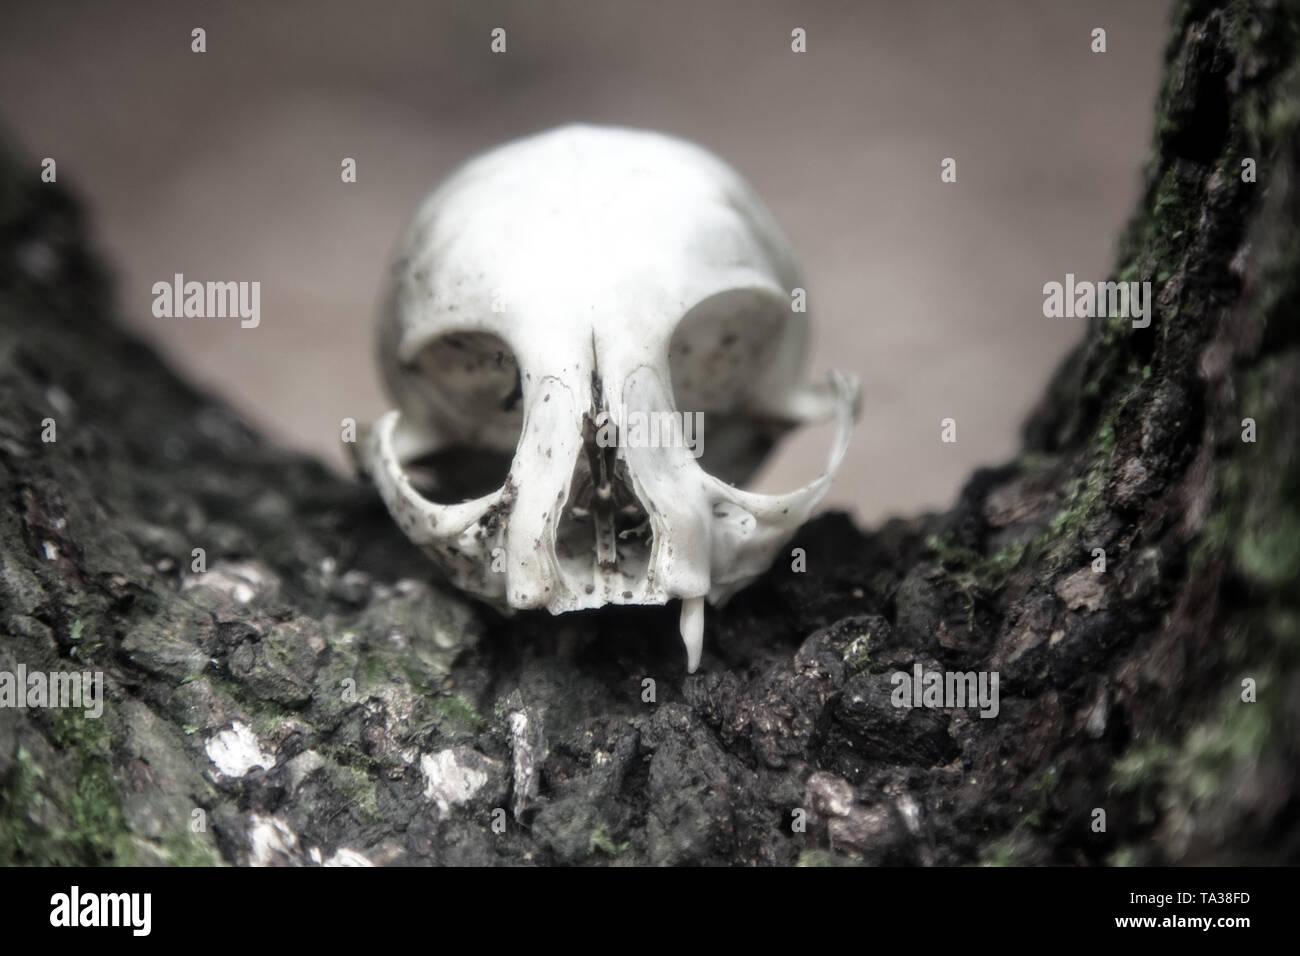 The skull as a symbol of death (memento mori). White animal skull with large eye sockets (orbital cavity) and predatory teeth (fang, tusk, canine toot - Stock Image